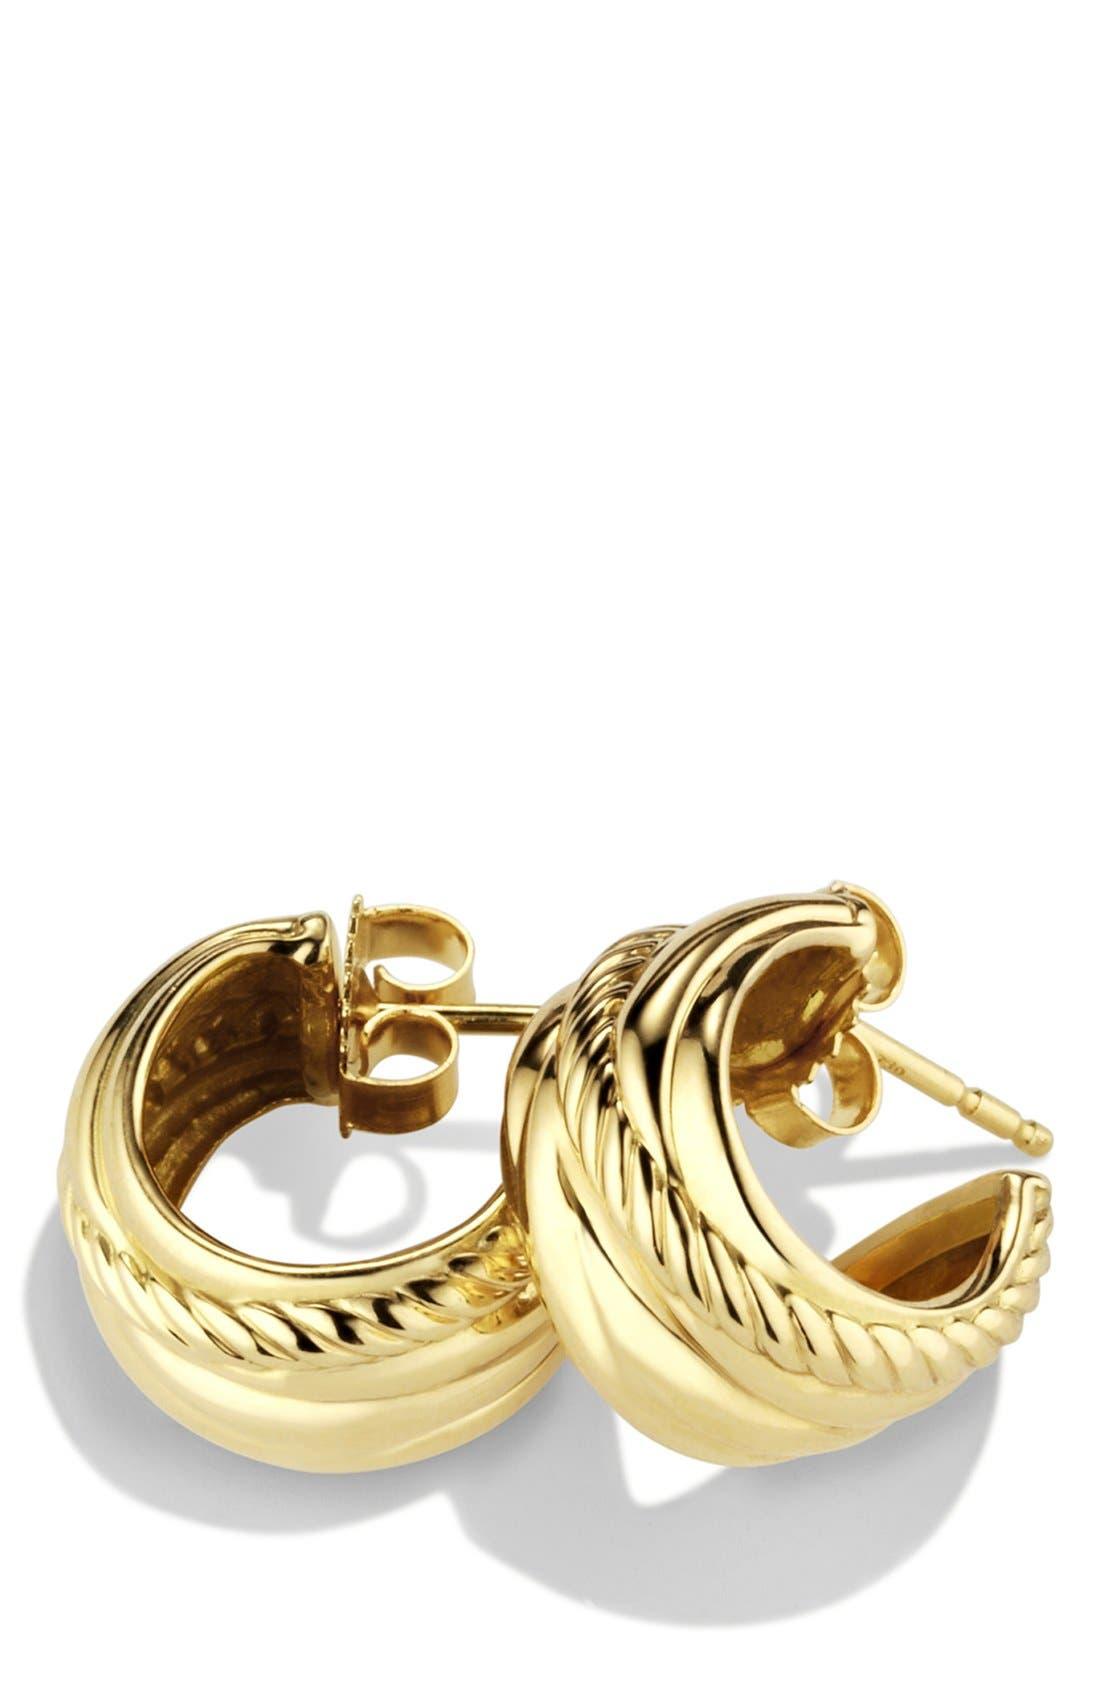 Alternate Image 2  - David Yurman 'Crossover' Earrings in Gold